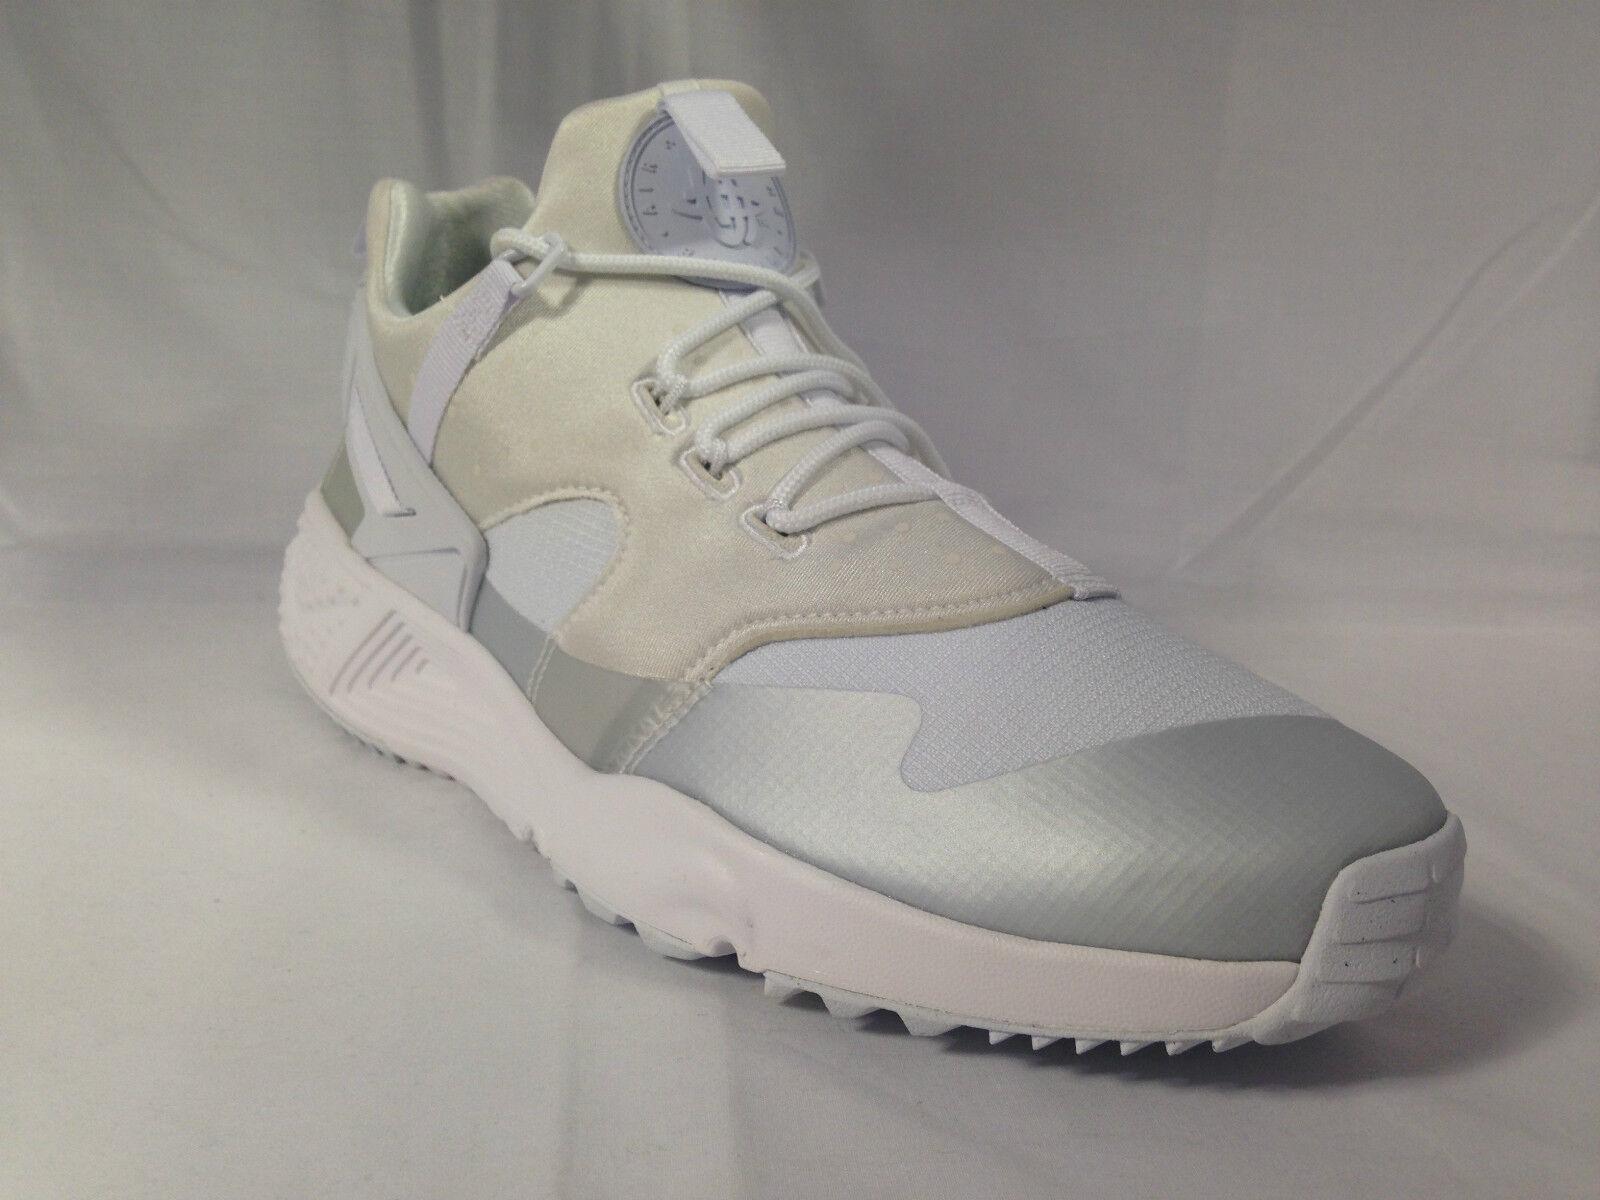 Mens Nike Air Huarache Utility White/White 806807 100 Sizes: _9_11_12